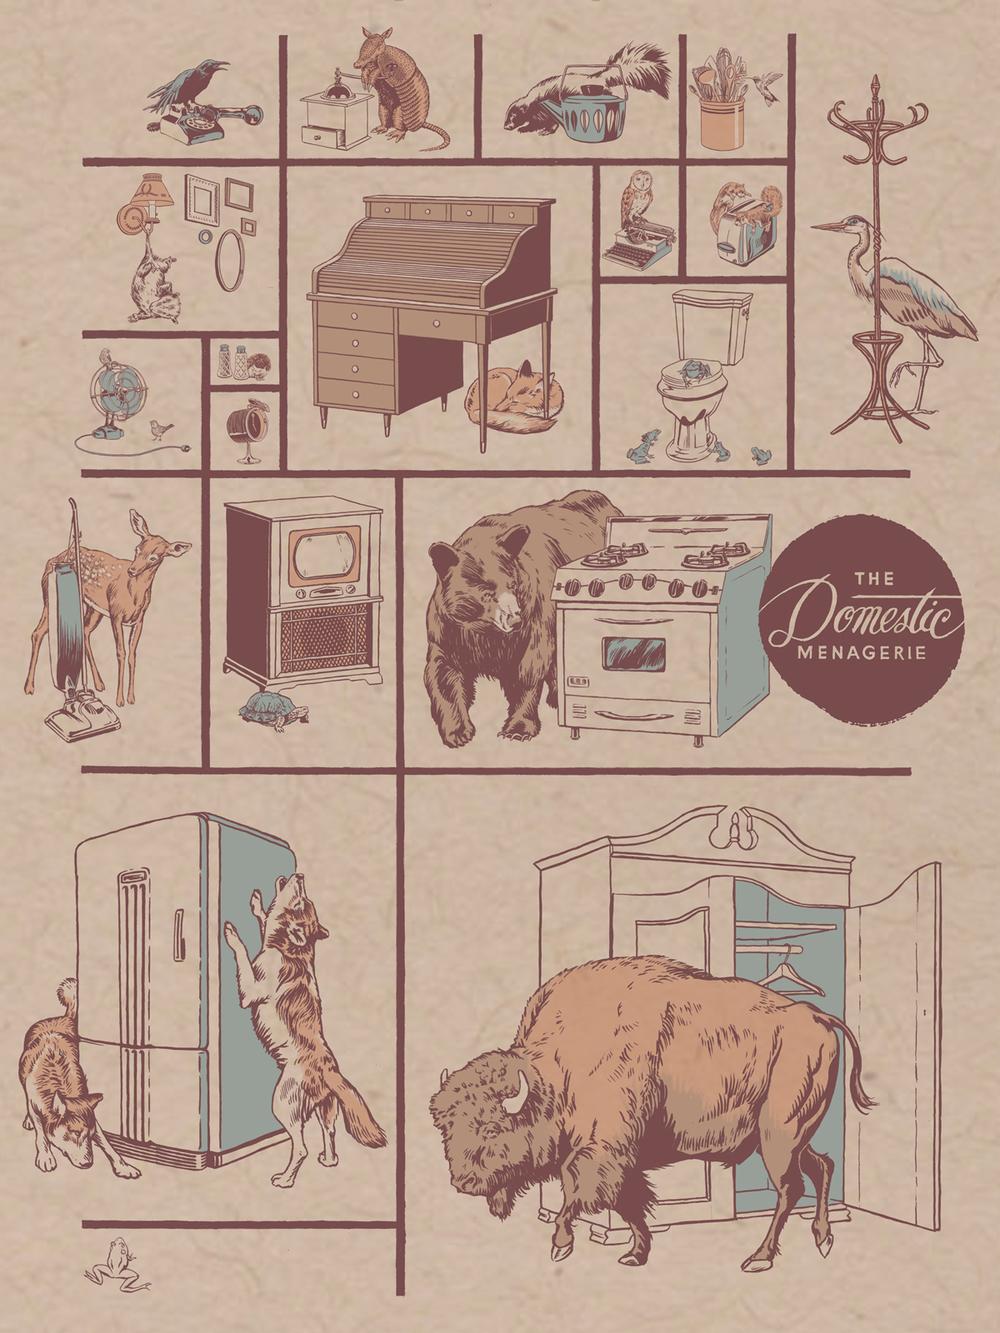 The Domestic Menagerie